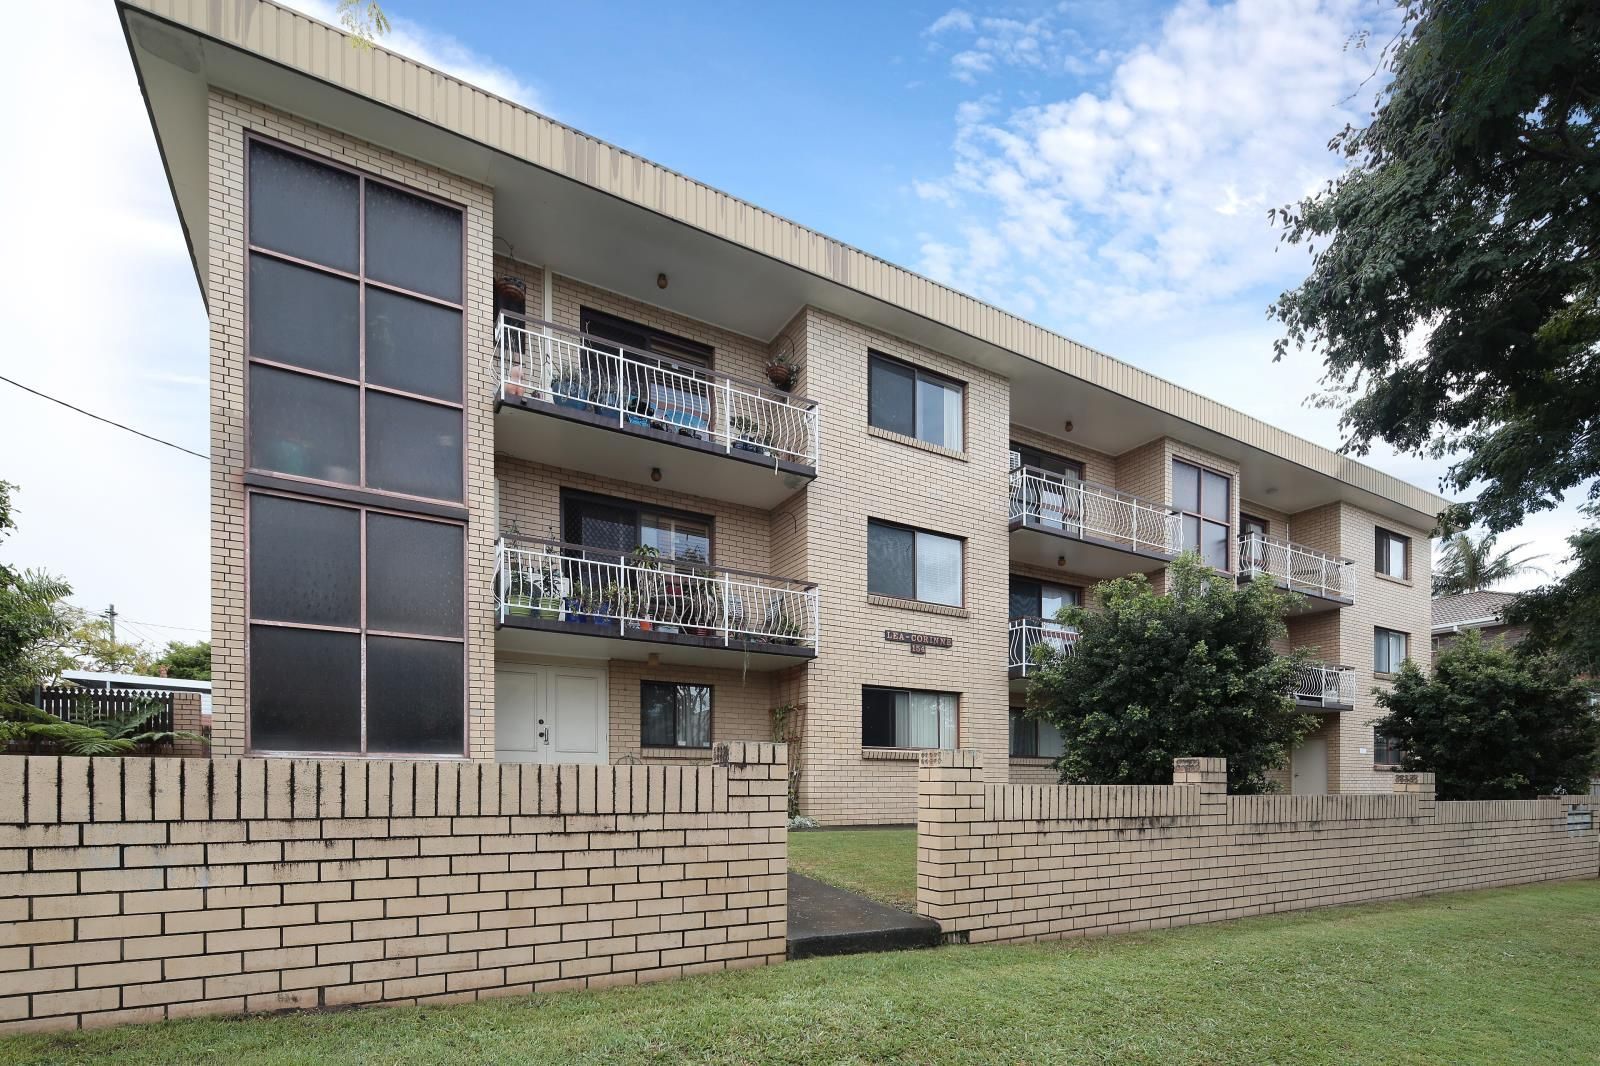 4/154 Flower Street, Northgate QLD 4013, Image 0